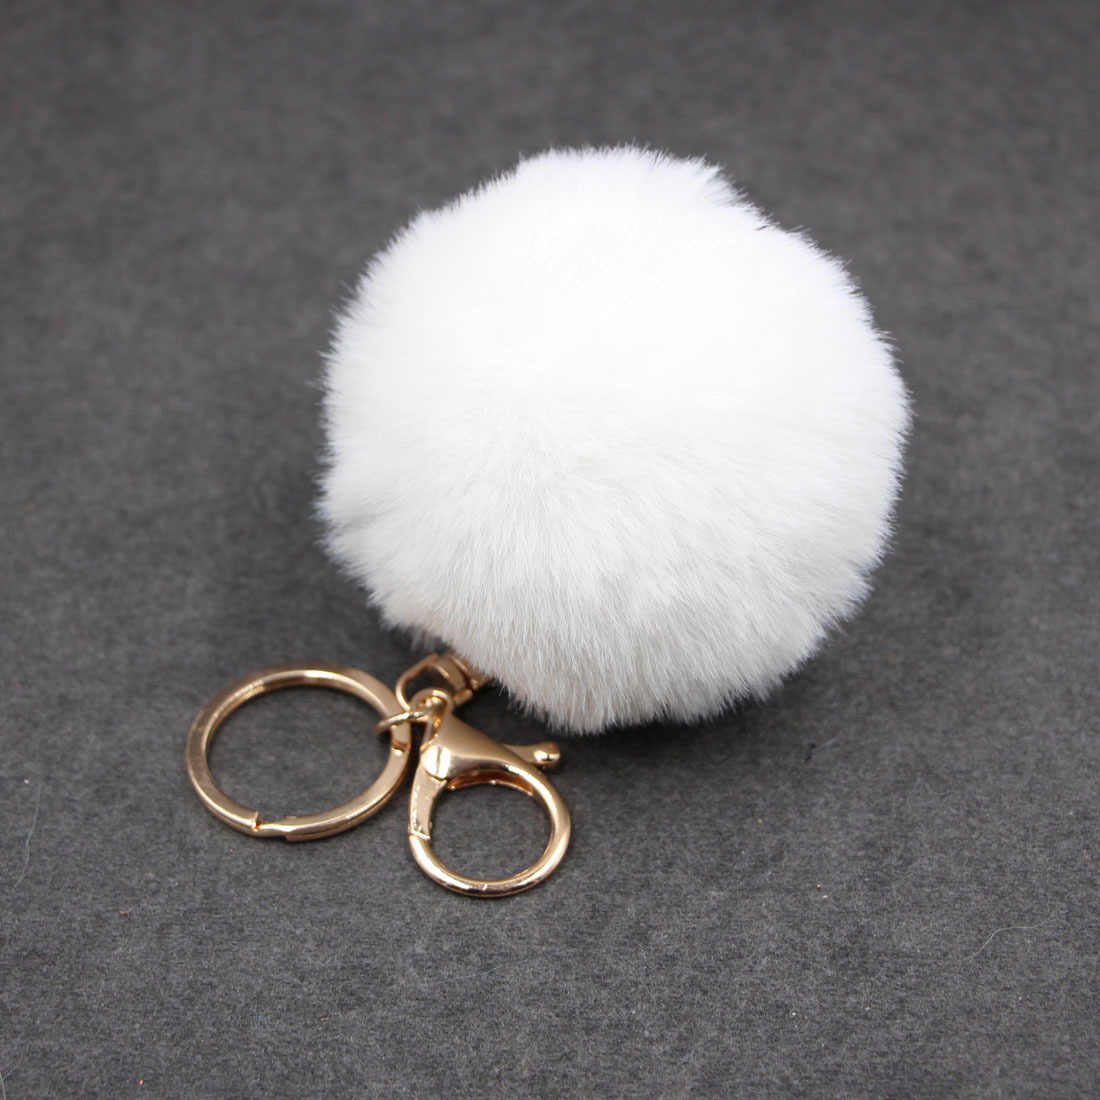 Porte Clef 8CM Rabbit Fur Keychain Backpack Bag Ball Trinkets Pom Pom Car Keyring Pendant Handbag Buckle Charms Bunny Key Chains